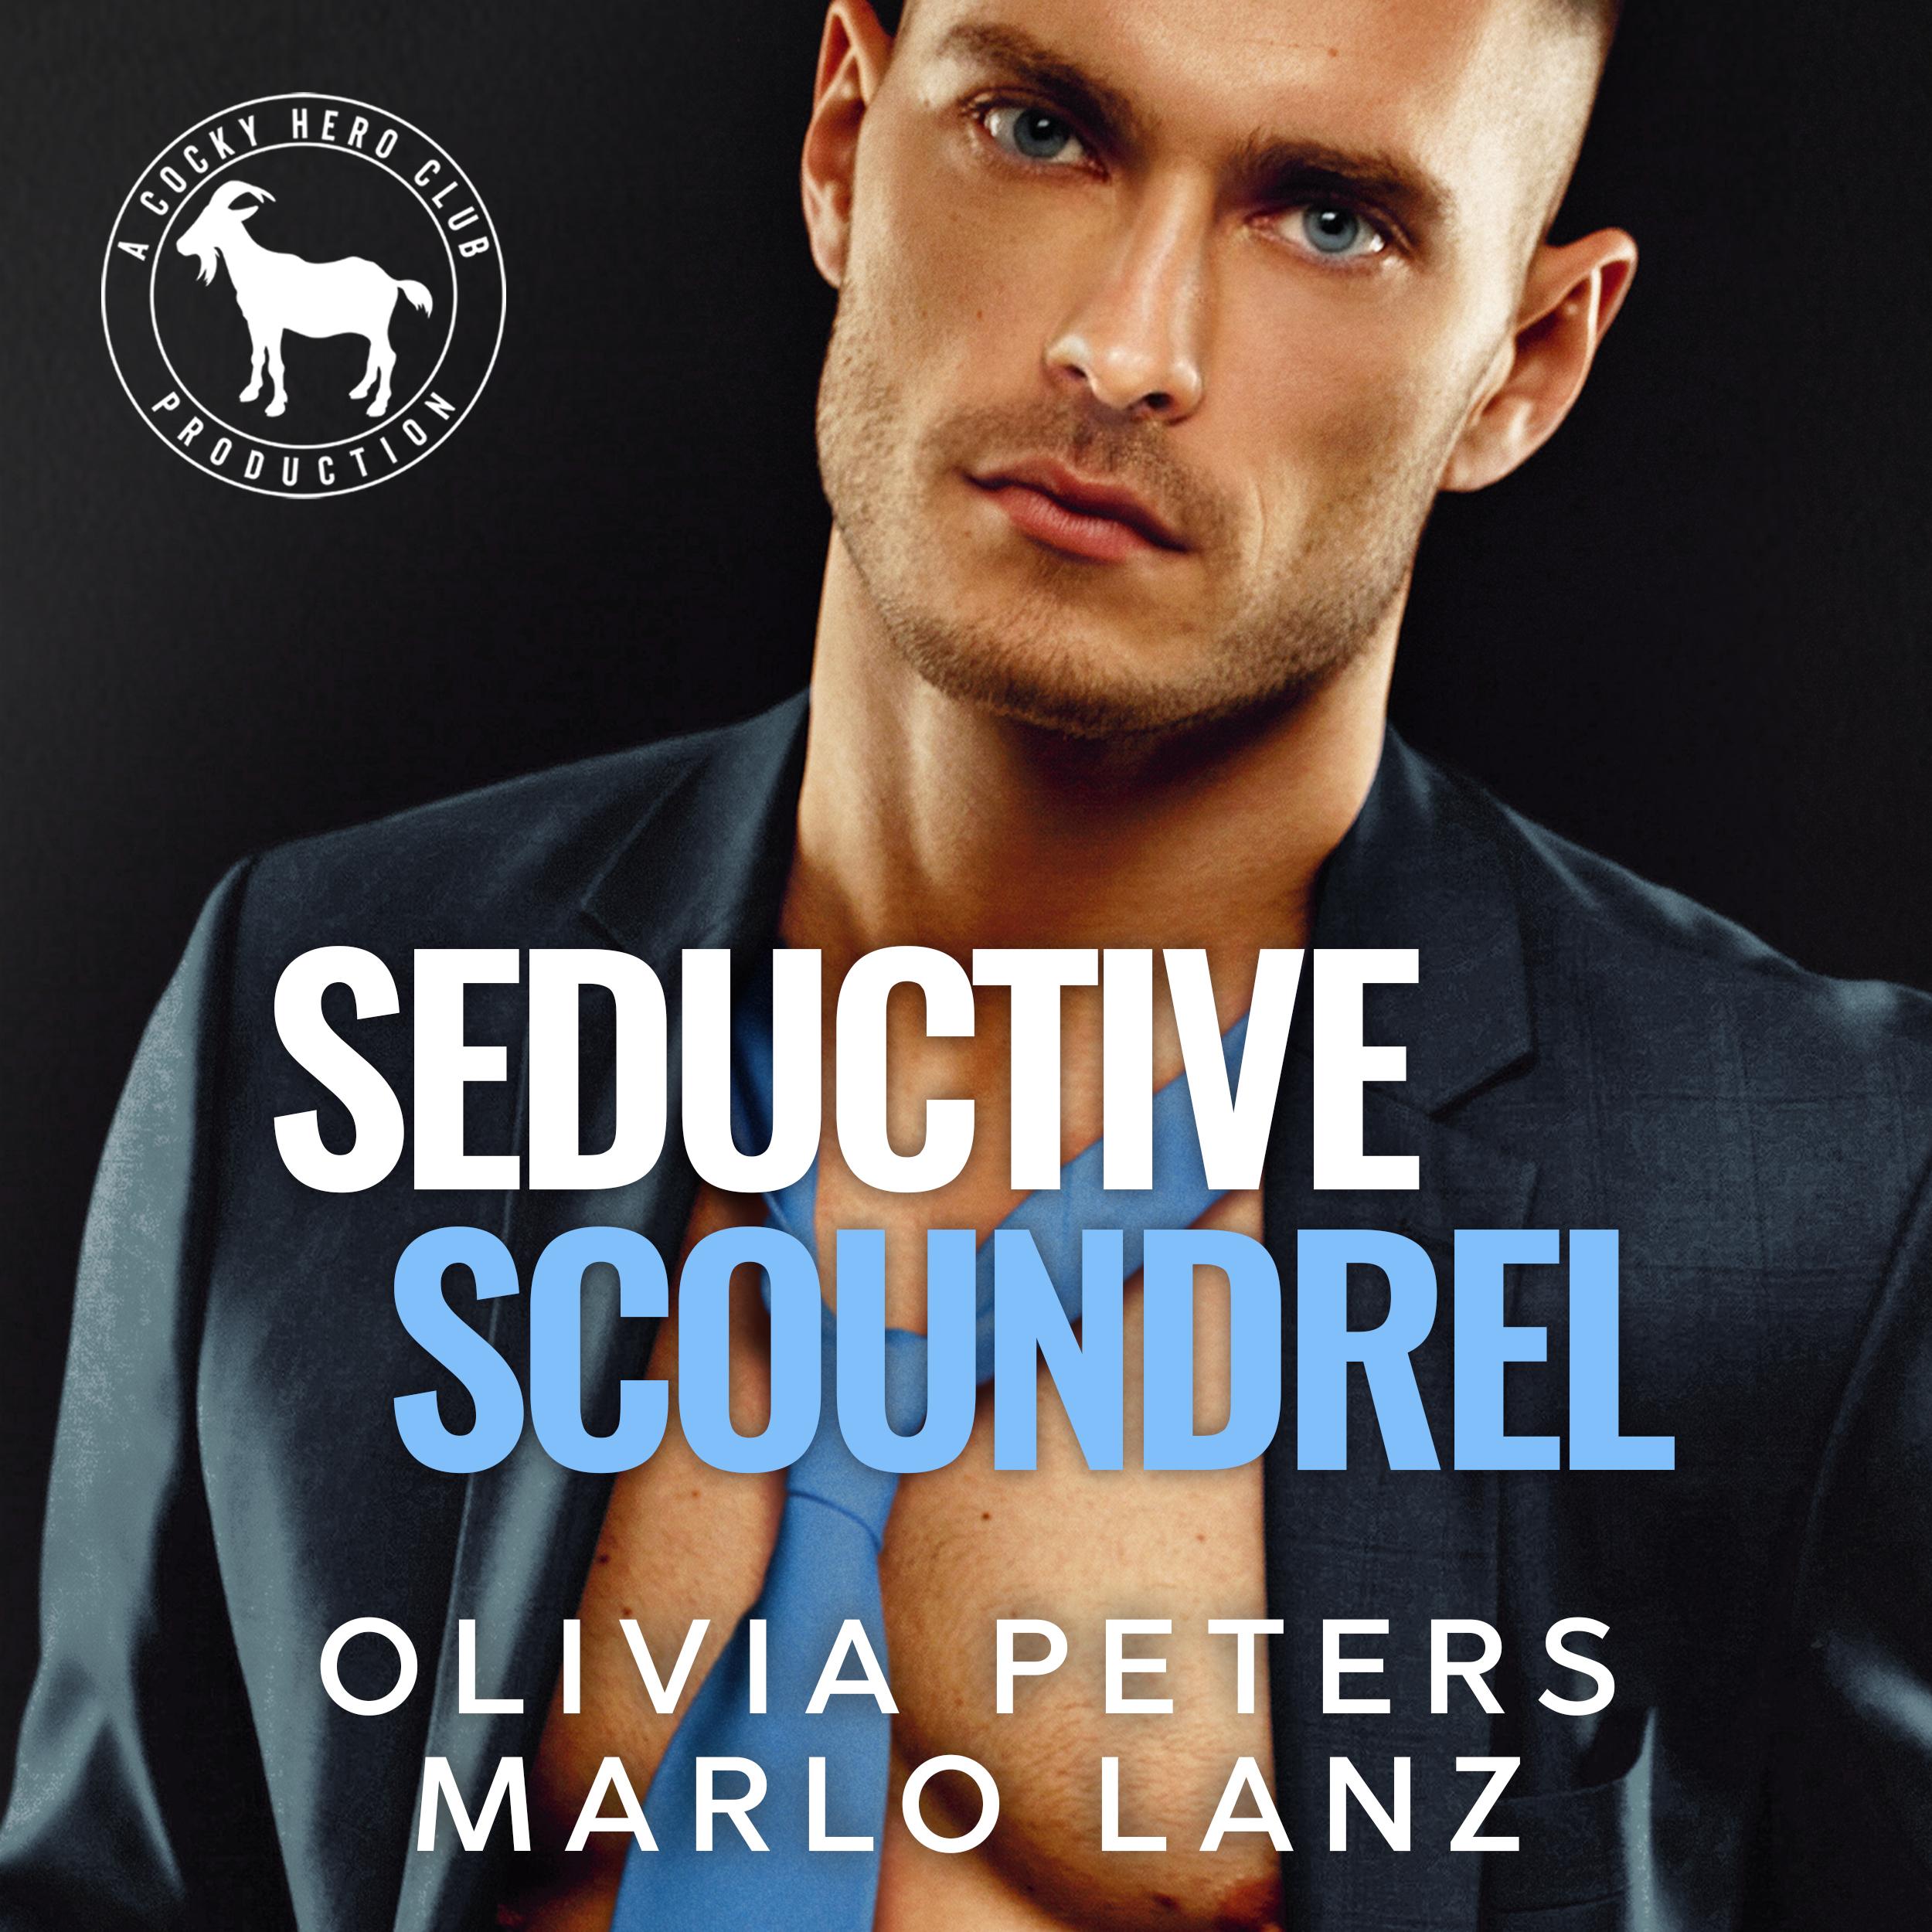 Seductive Scoundrel Audiobook